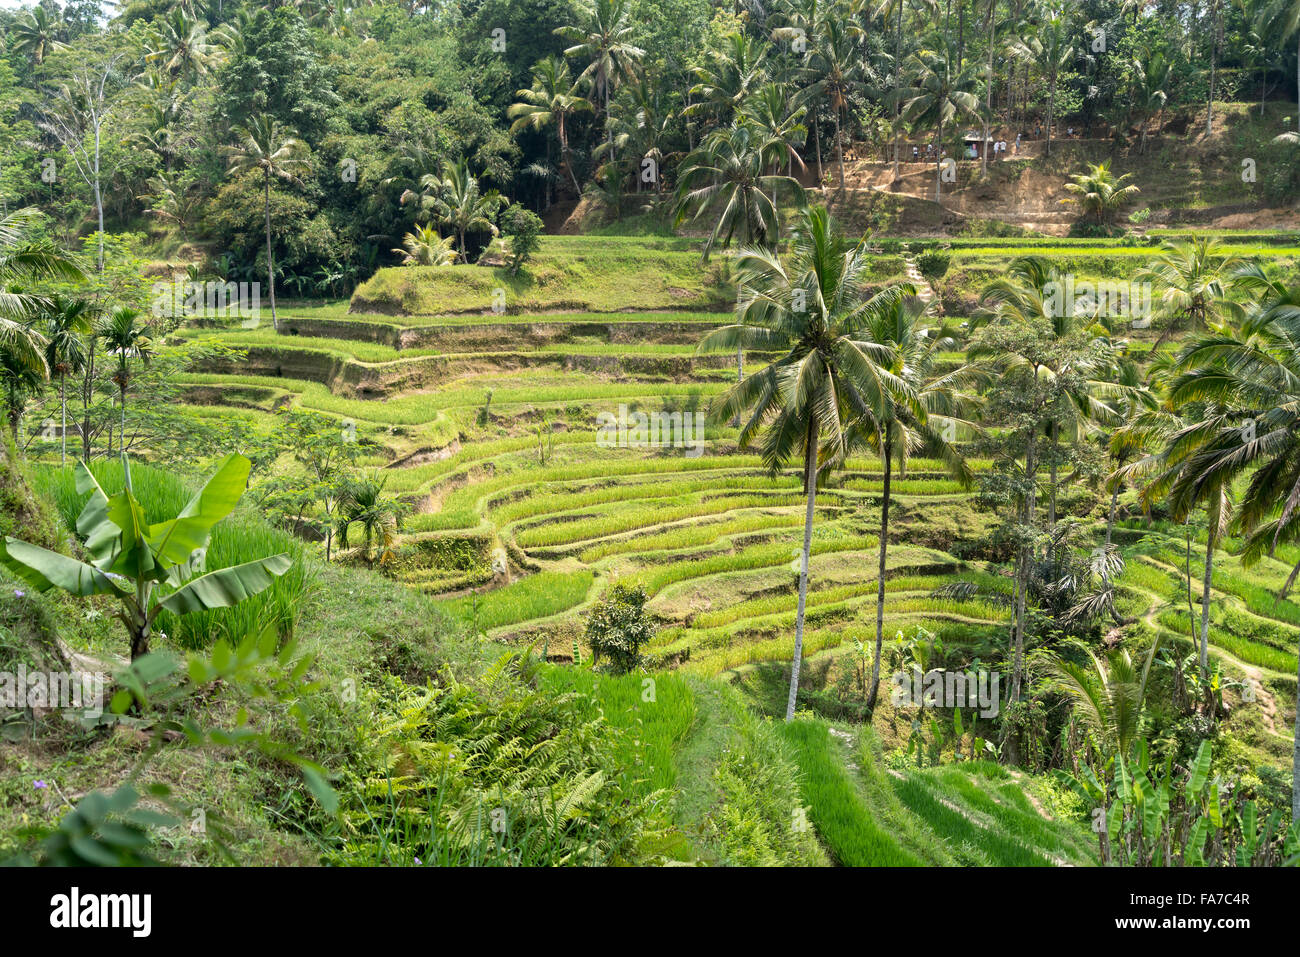 Les terrasses de riz de Tegalalang près de Ubud, Bali, Indonésie Photo Stock